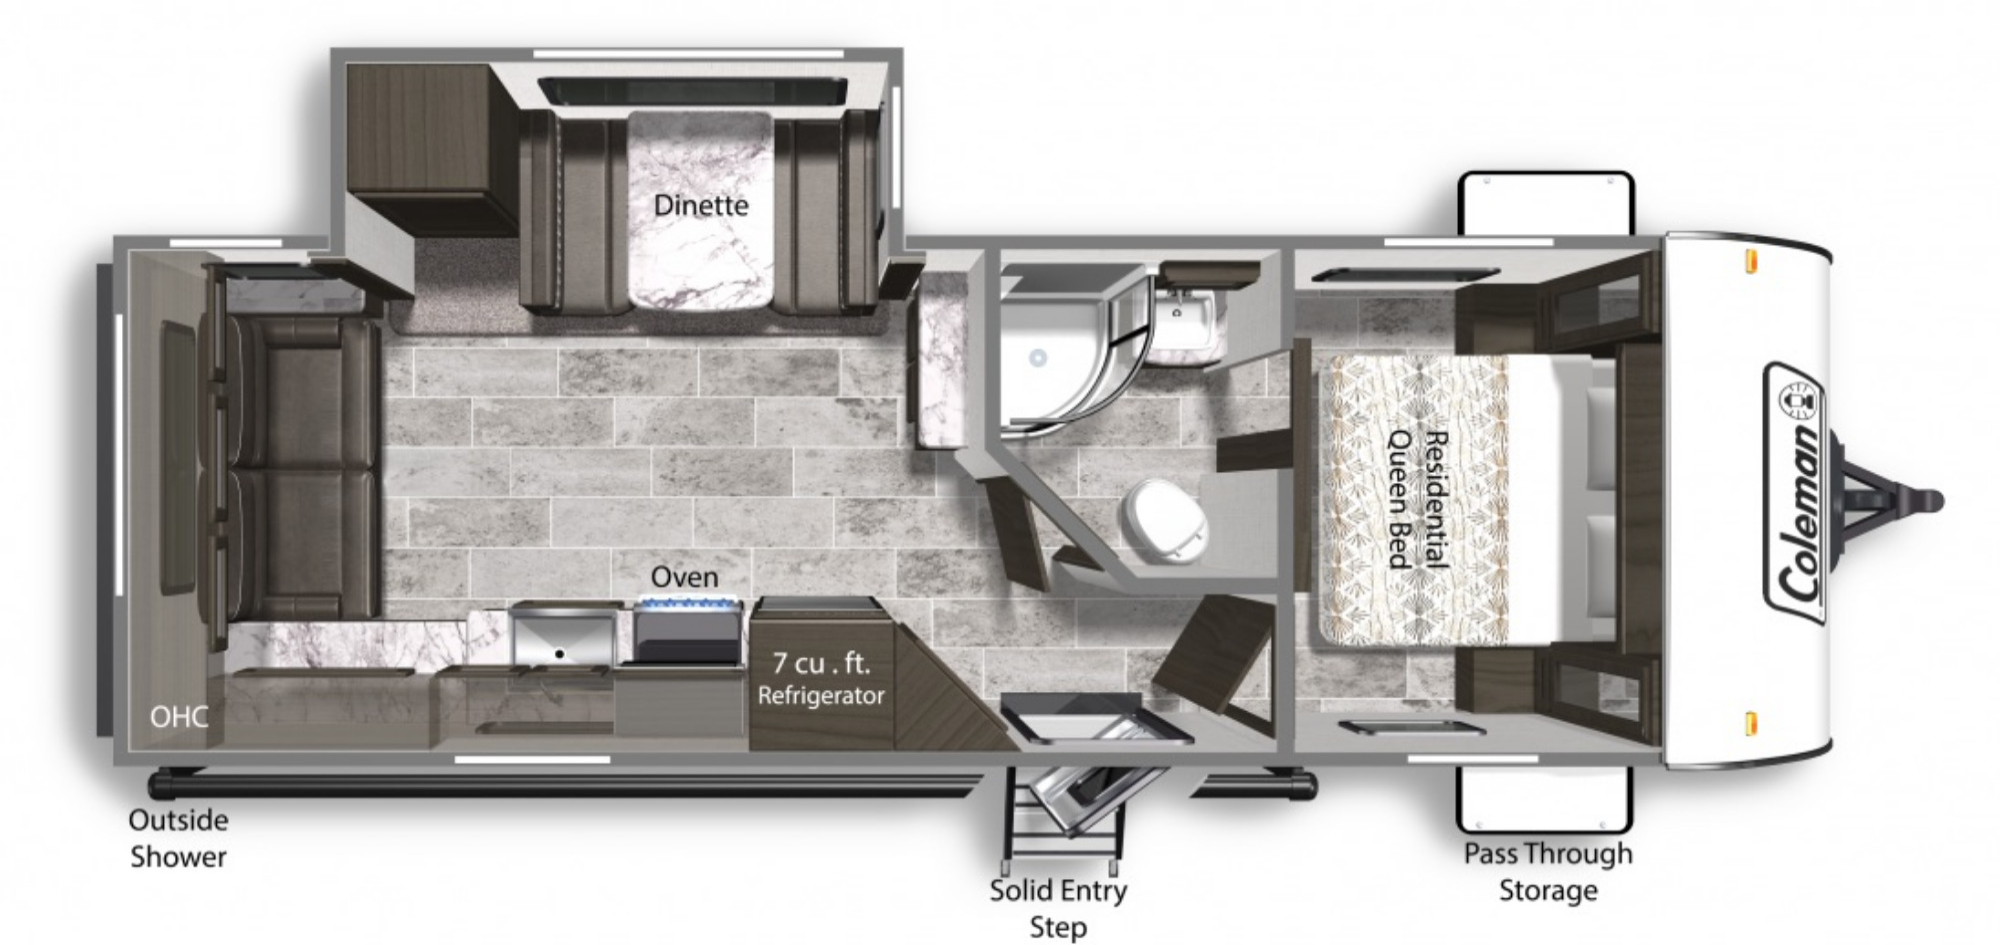 View Floor Plan for 2022 COLEMAN COLEMAN LIGHT 2515RL